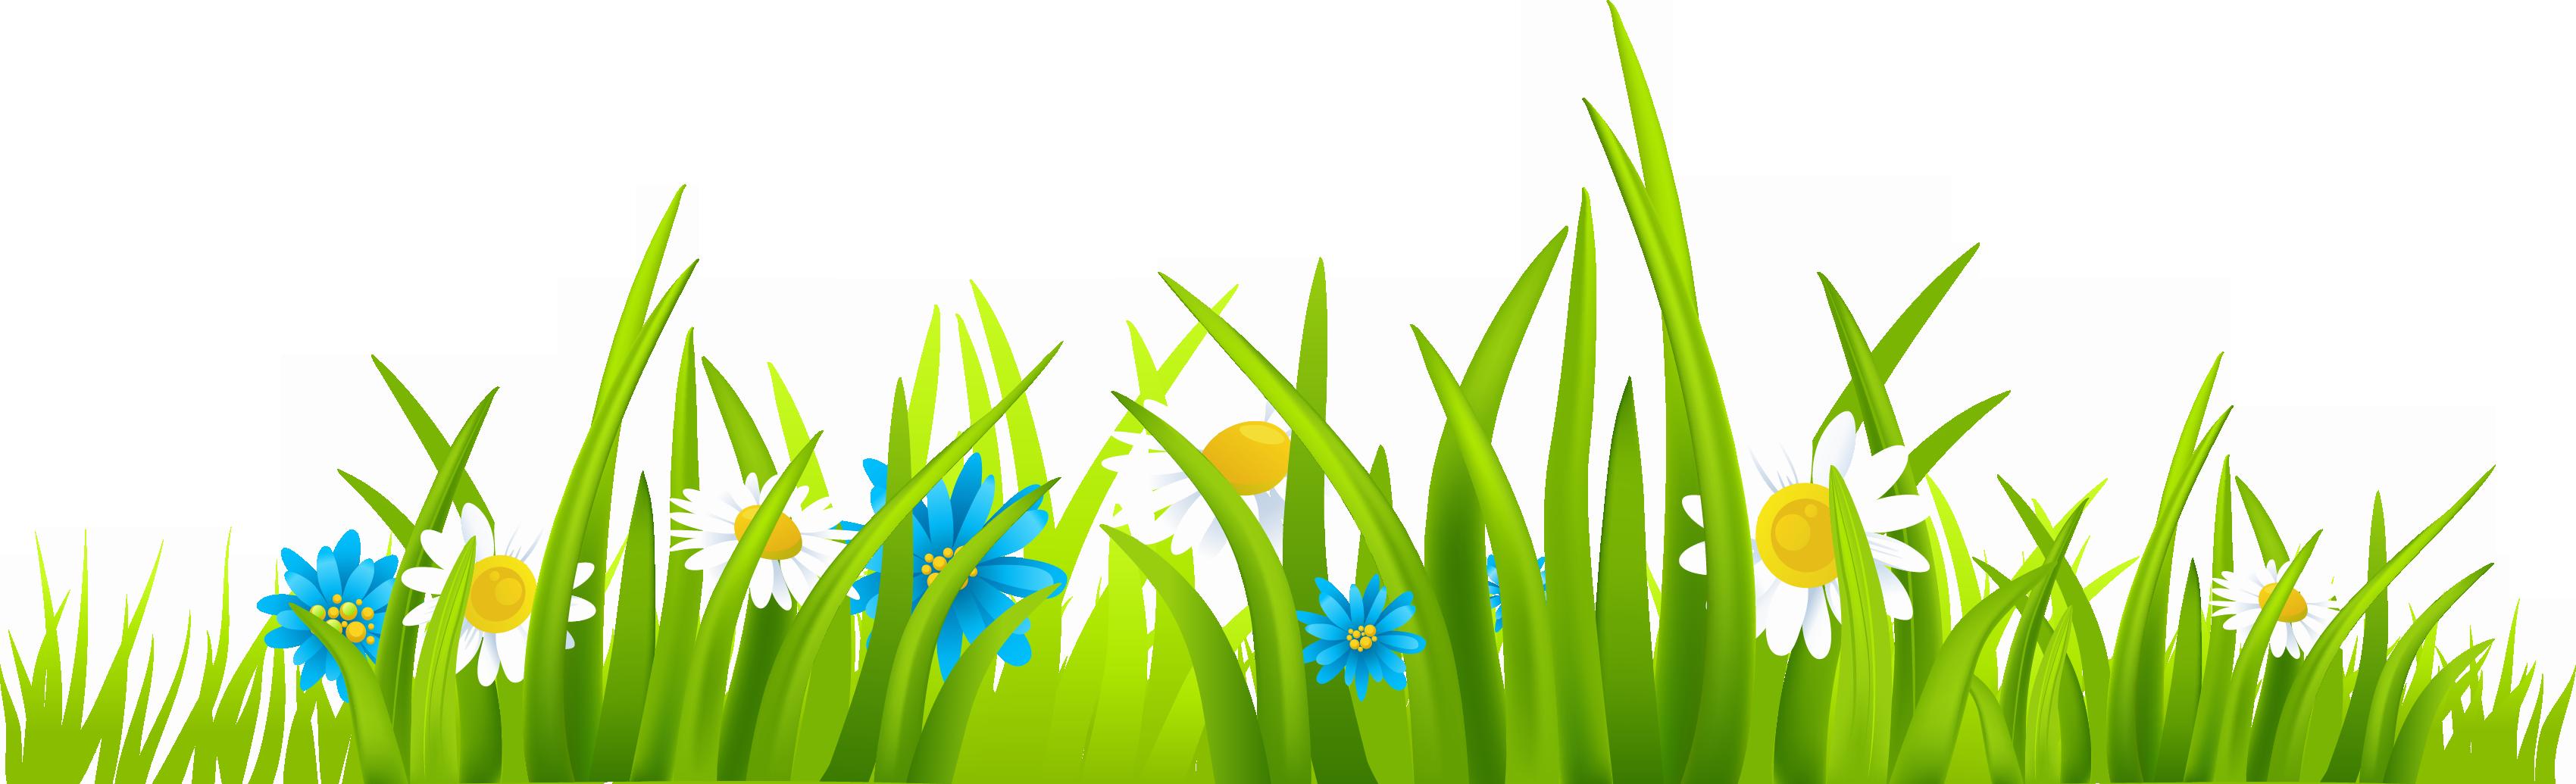 Grass clip art free. Clipart mountain spring